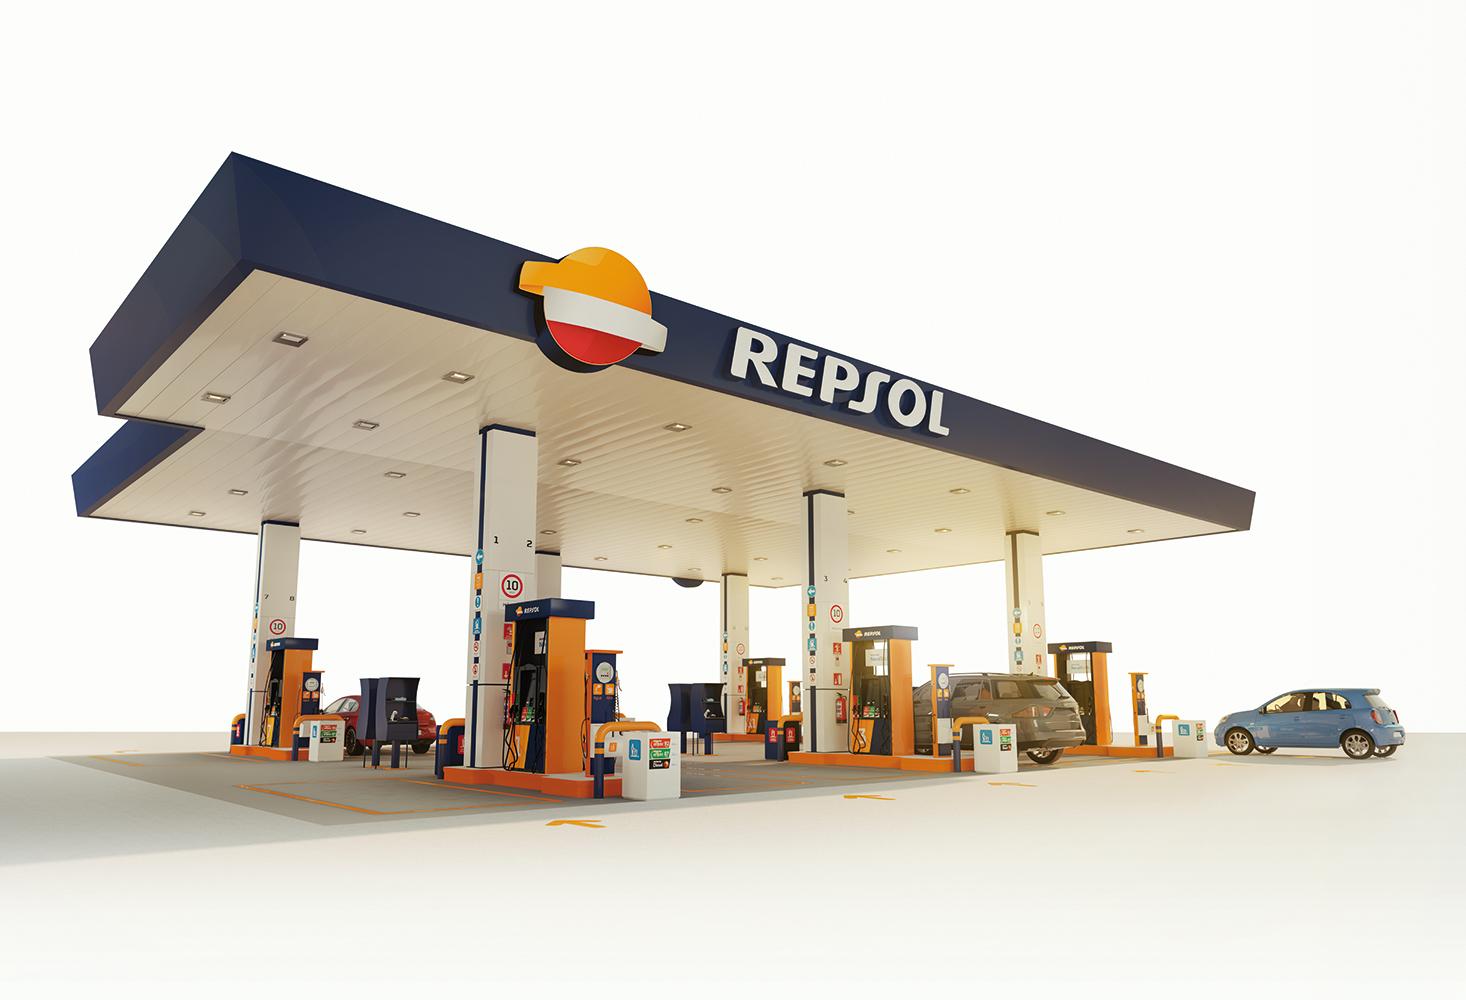 CGI Image Repsol Mexico by Studio Capicúa